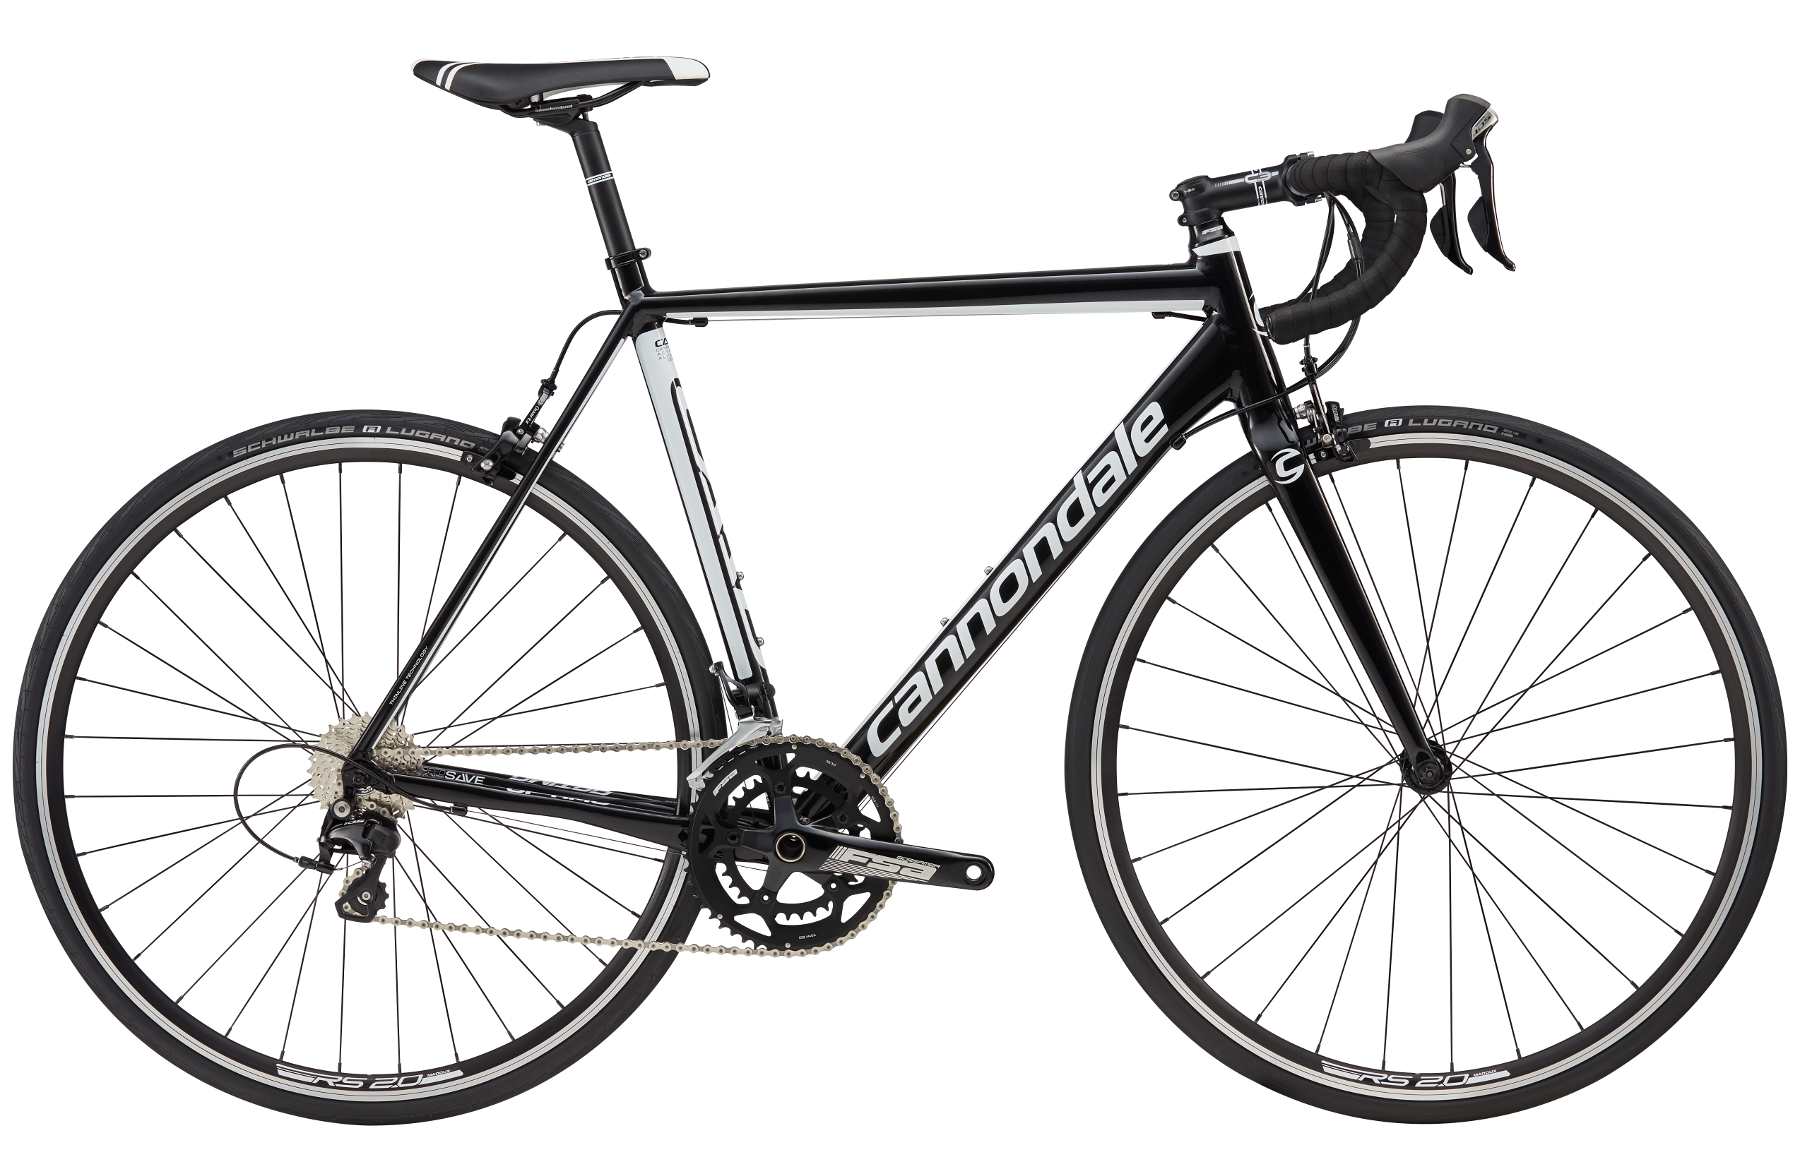 Vélo Cannondale CAAD Optimo 105 Noir 2017 - 54 cm